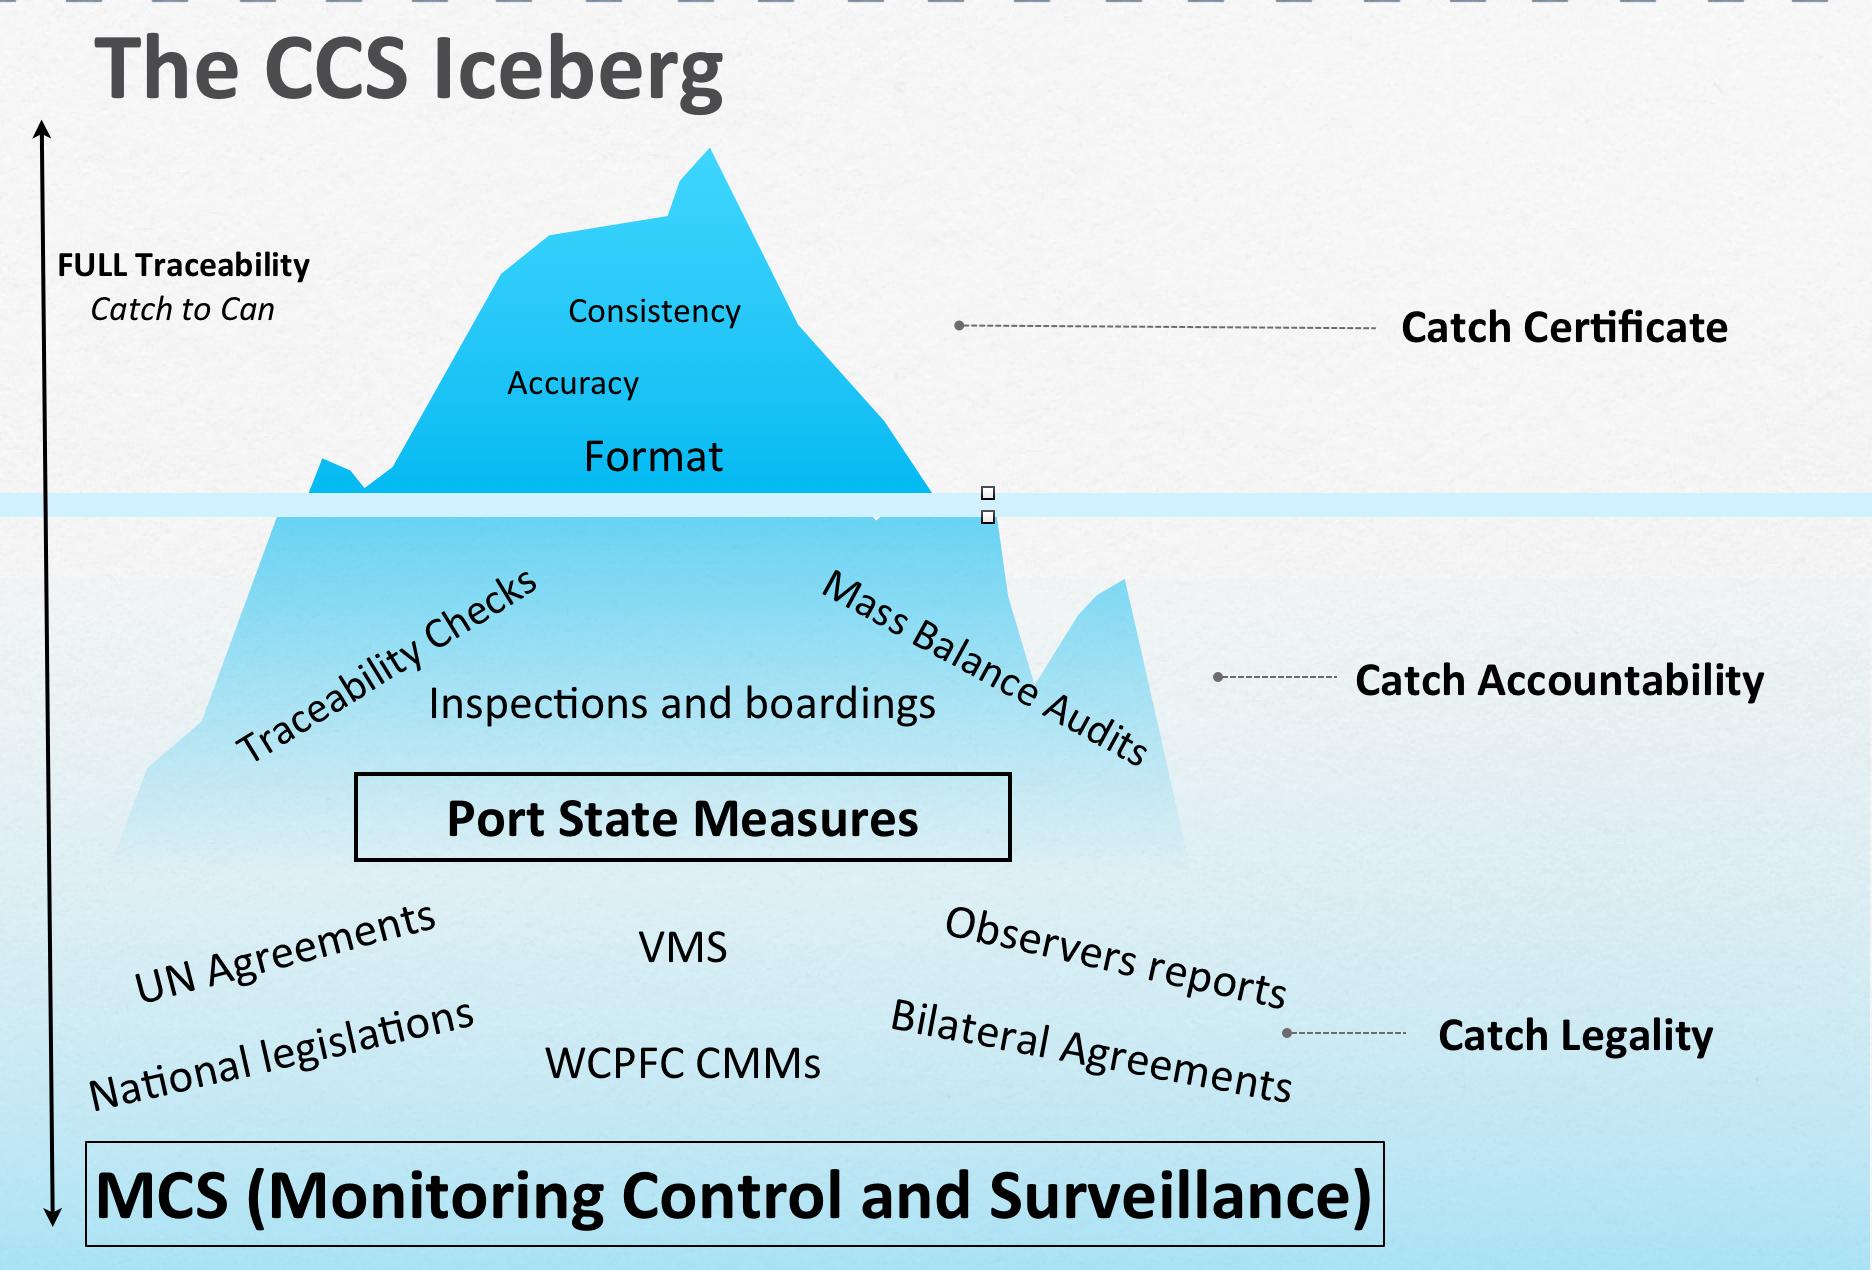 CC iceberg.png